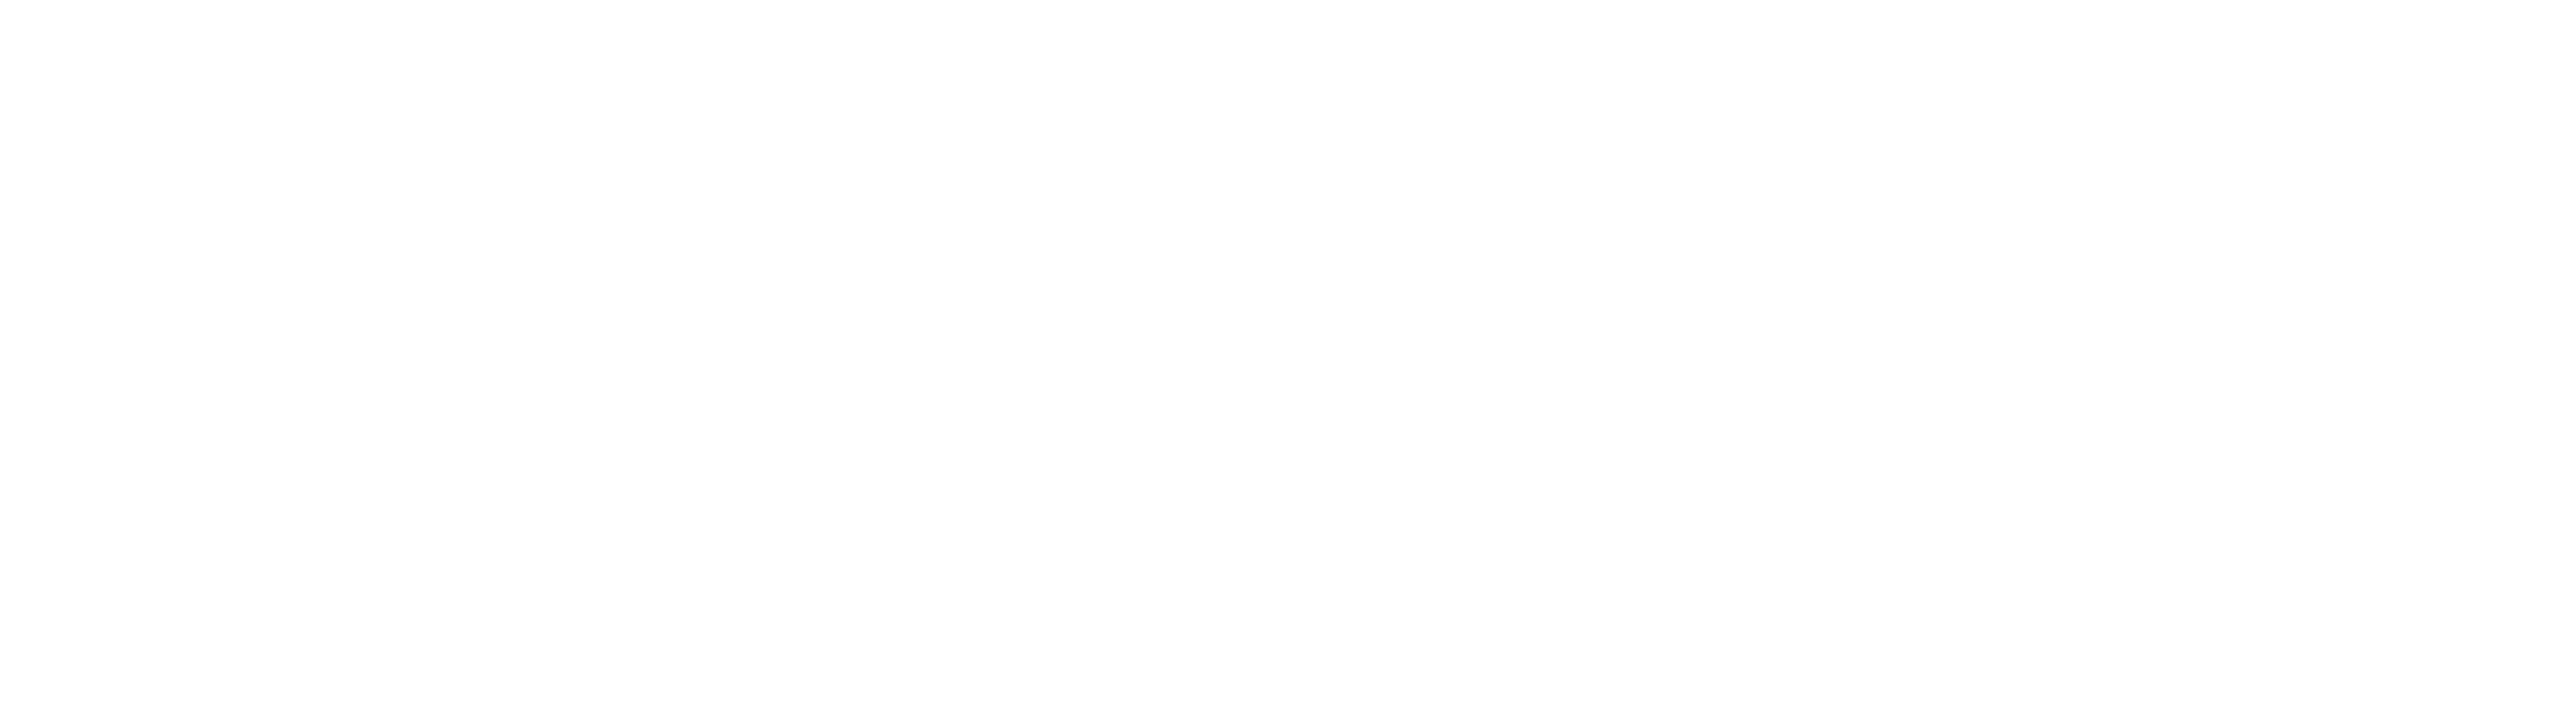 nasa_worm